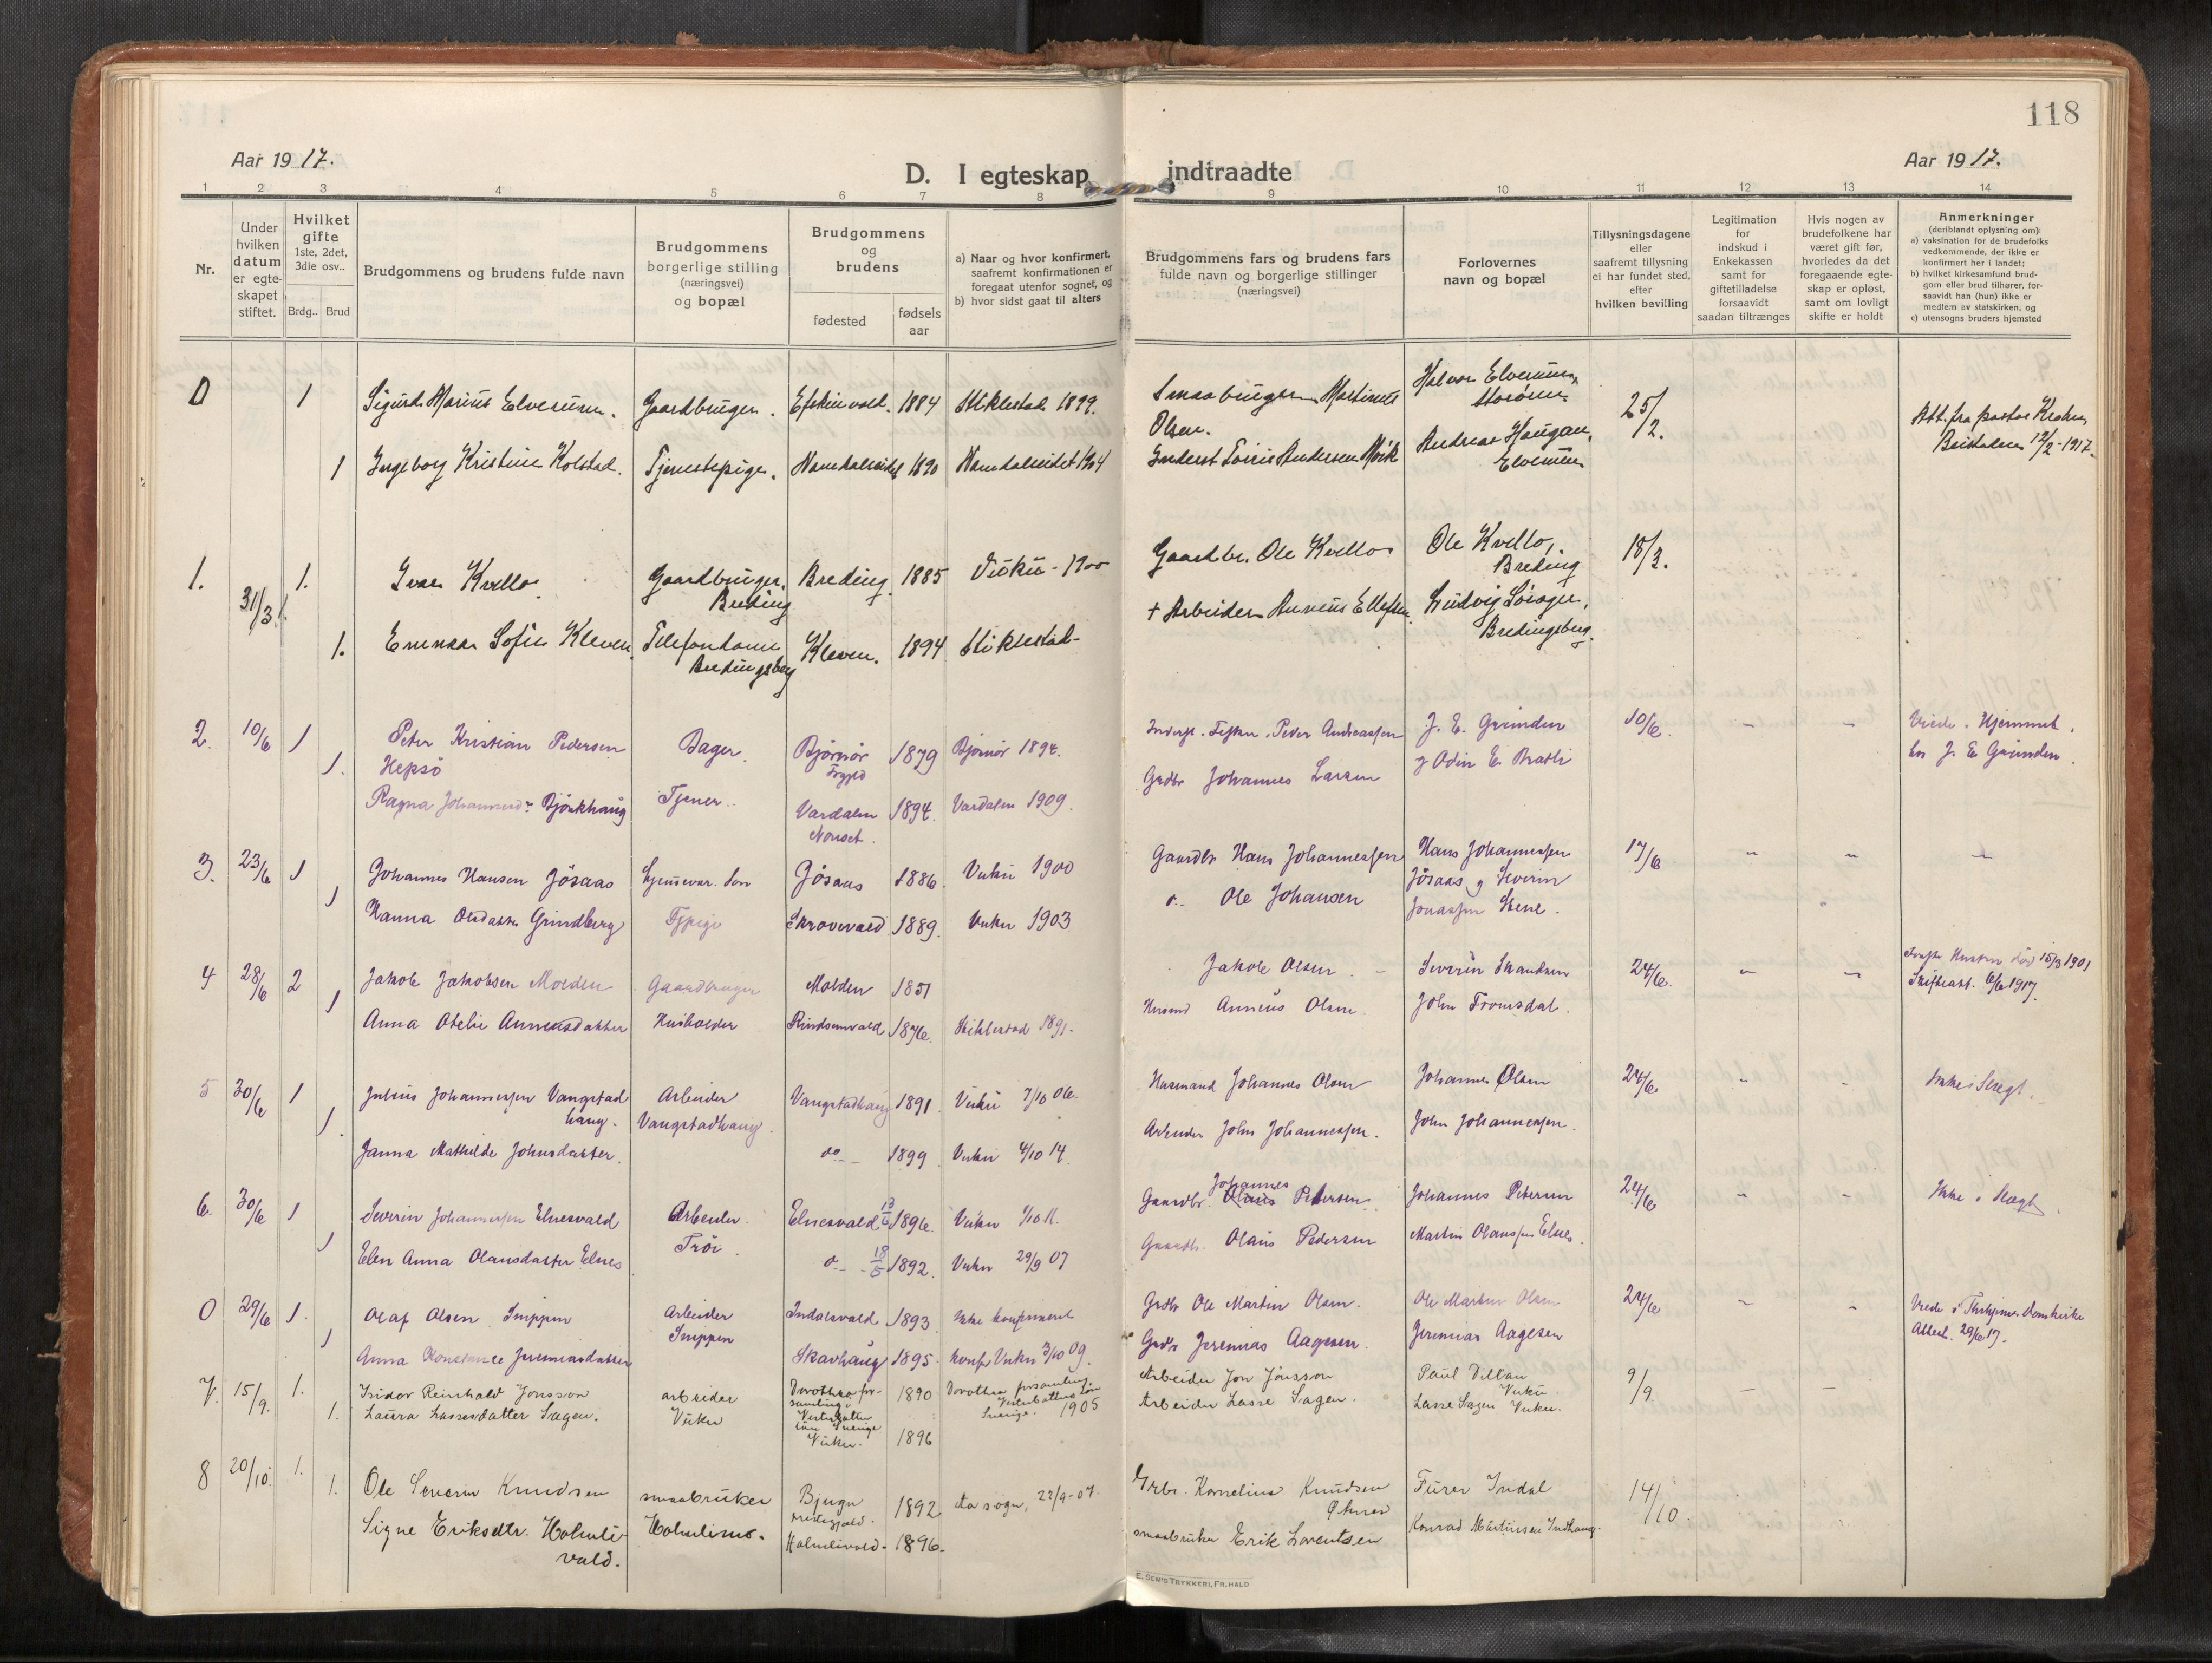 SAT, Verdal sokneprestkontor, H/Haa/L0004: Ministerialbok nr. 4, 1916-1928, s. 118